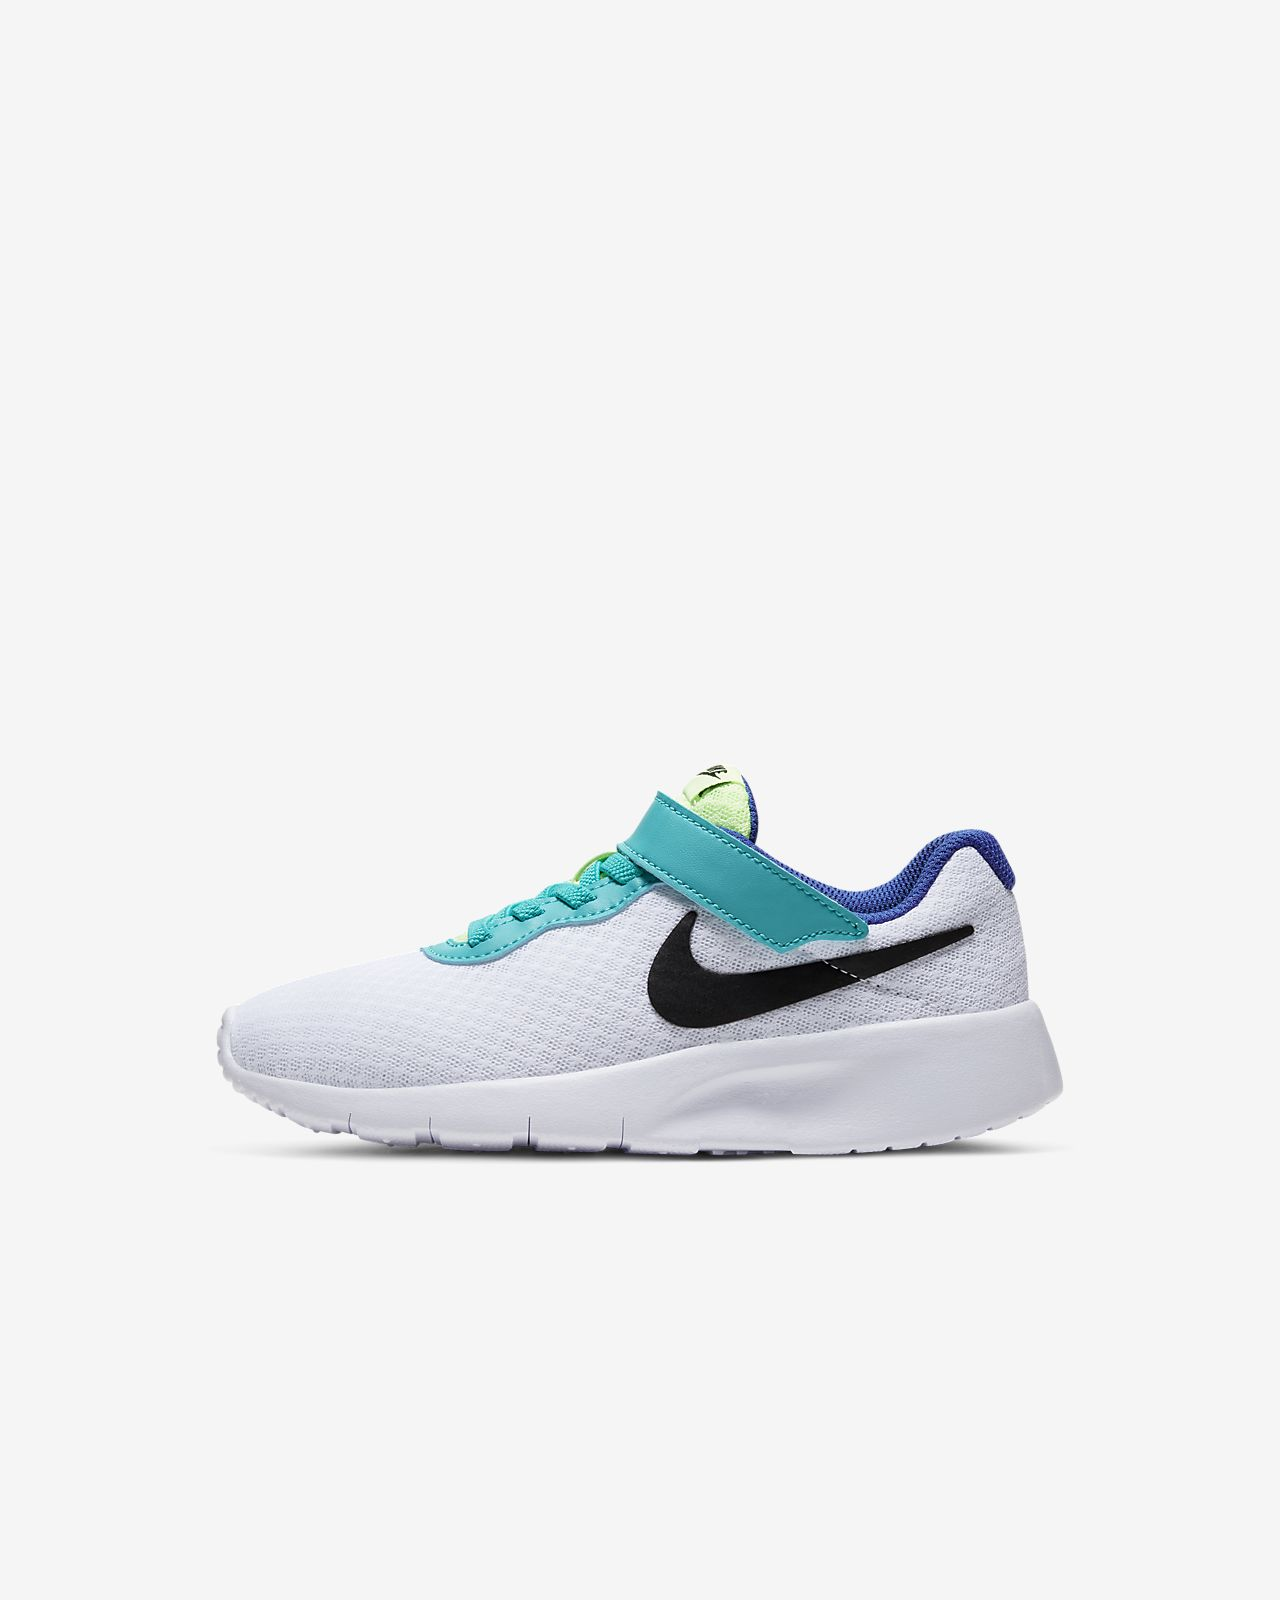 Nike Tanjun BPV 幼童运动童鞋